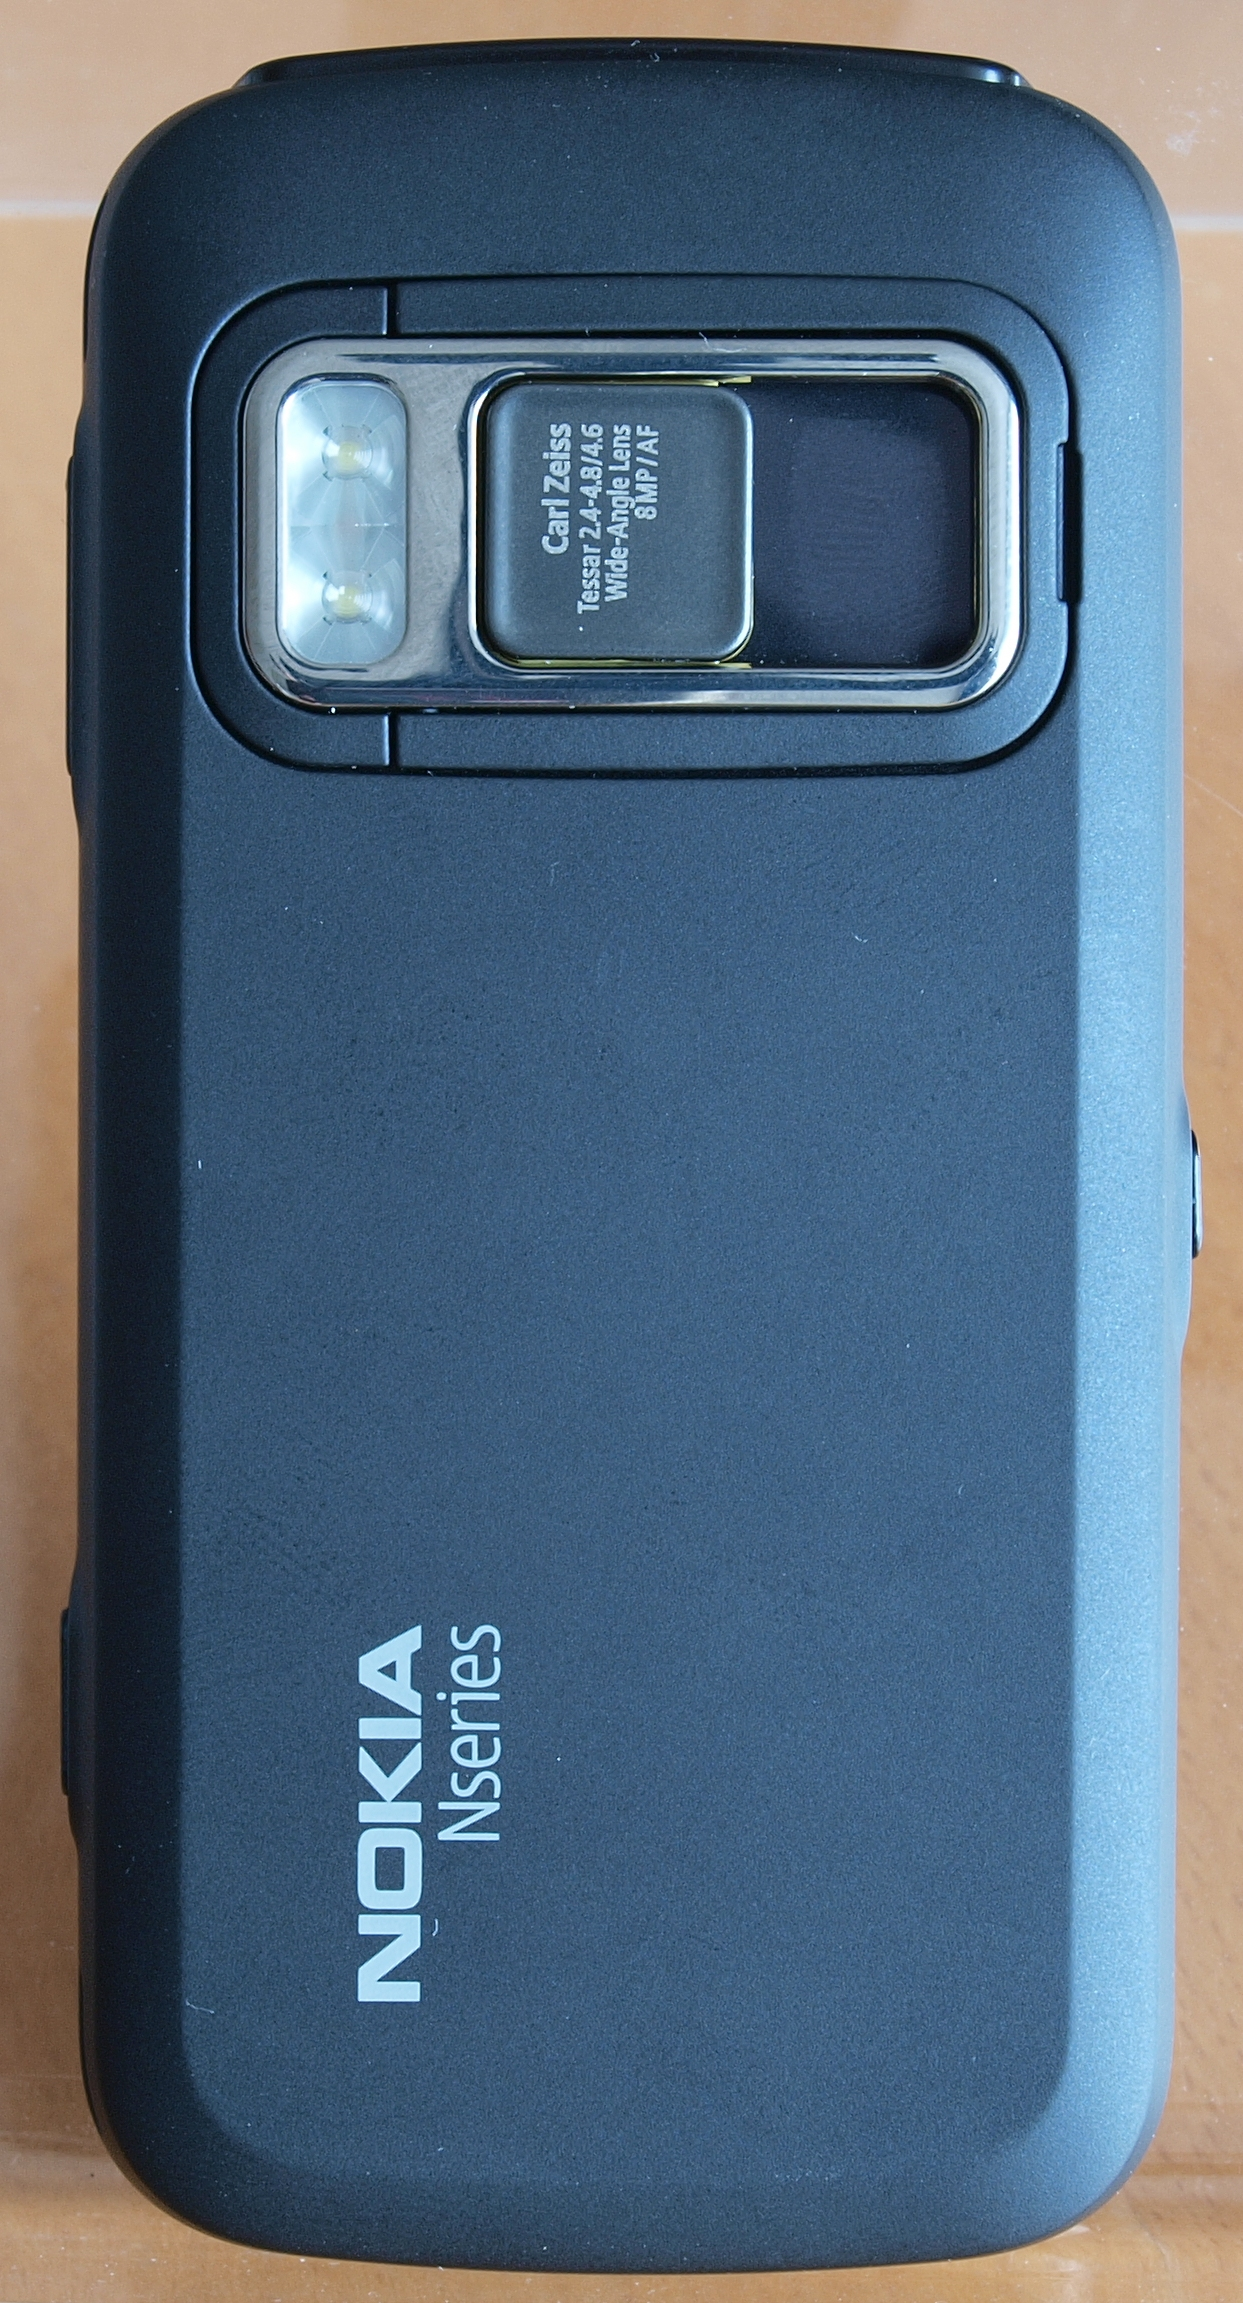 Nokia n86 back nokia n86 8mp review physical nokia n86 stand nokia n86